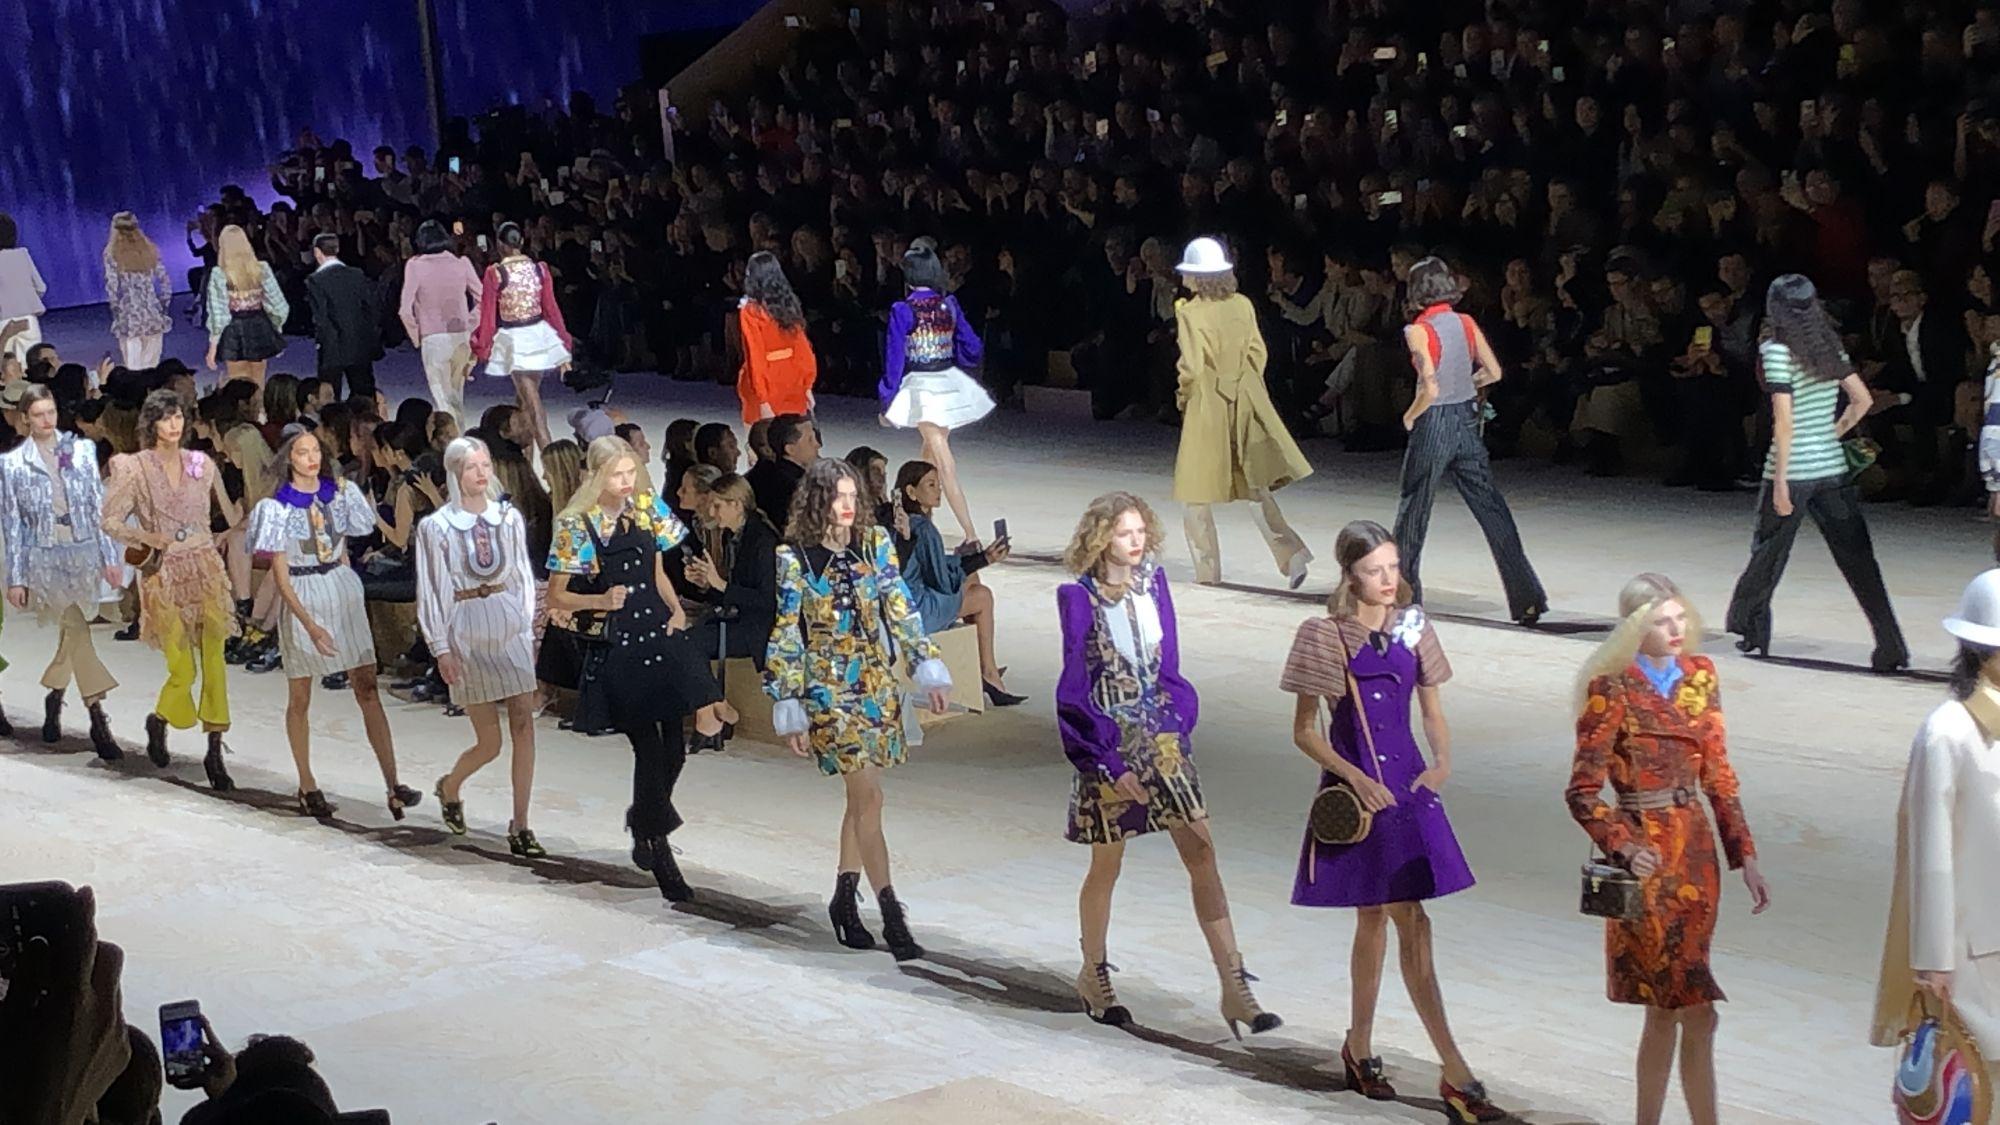 Paris Fashion Week Spring/Summer 2020: Day 8 Highlights